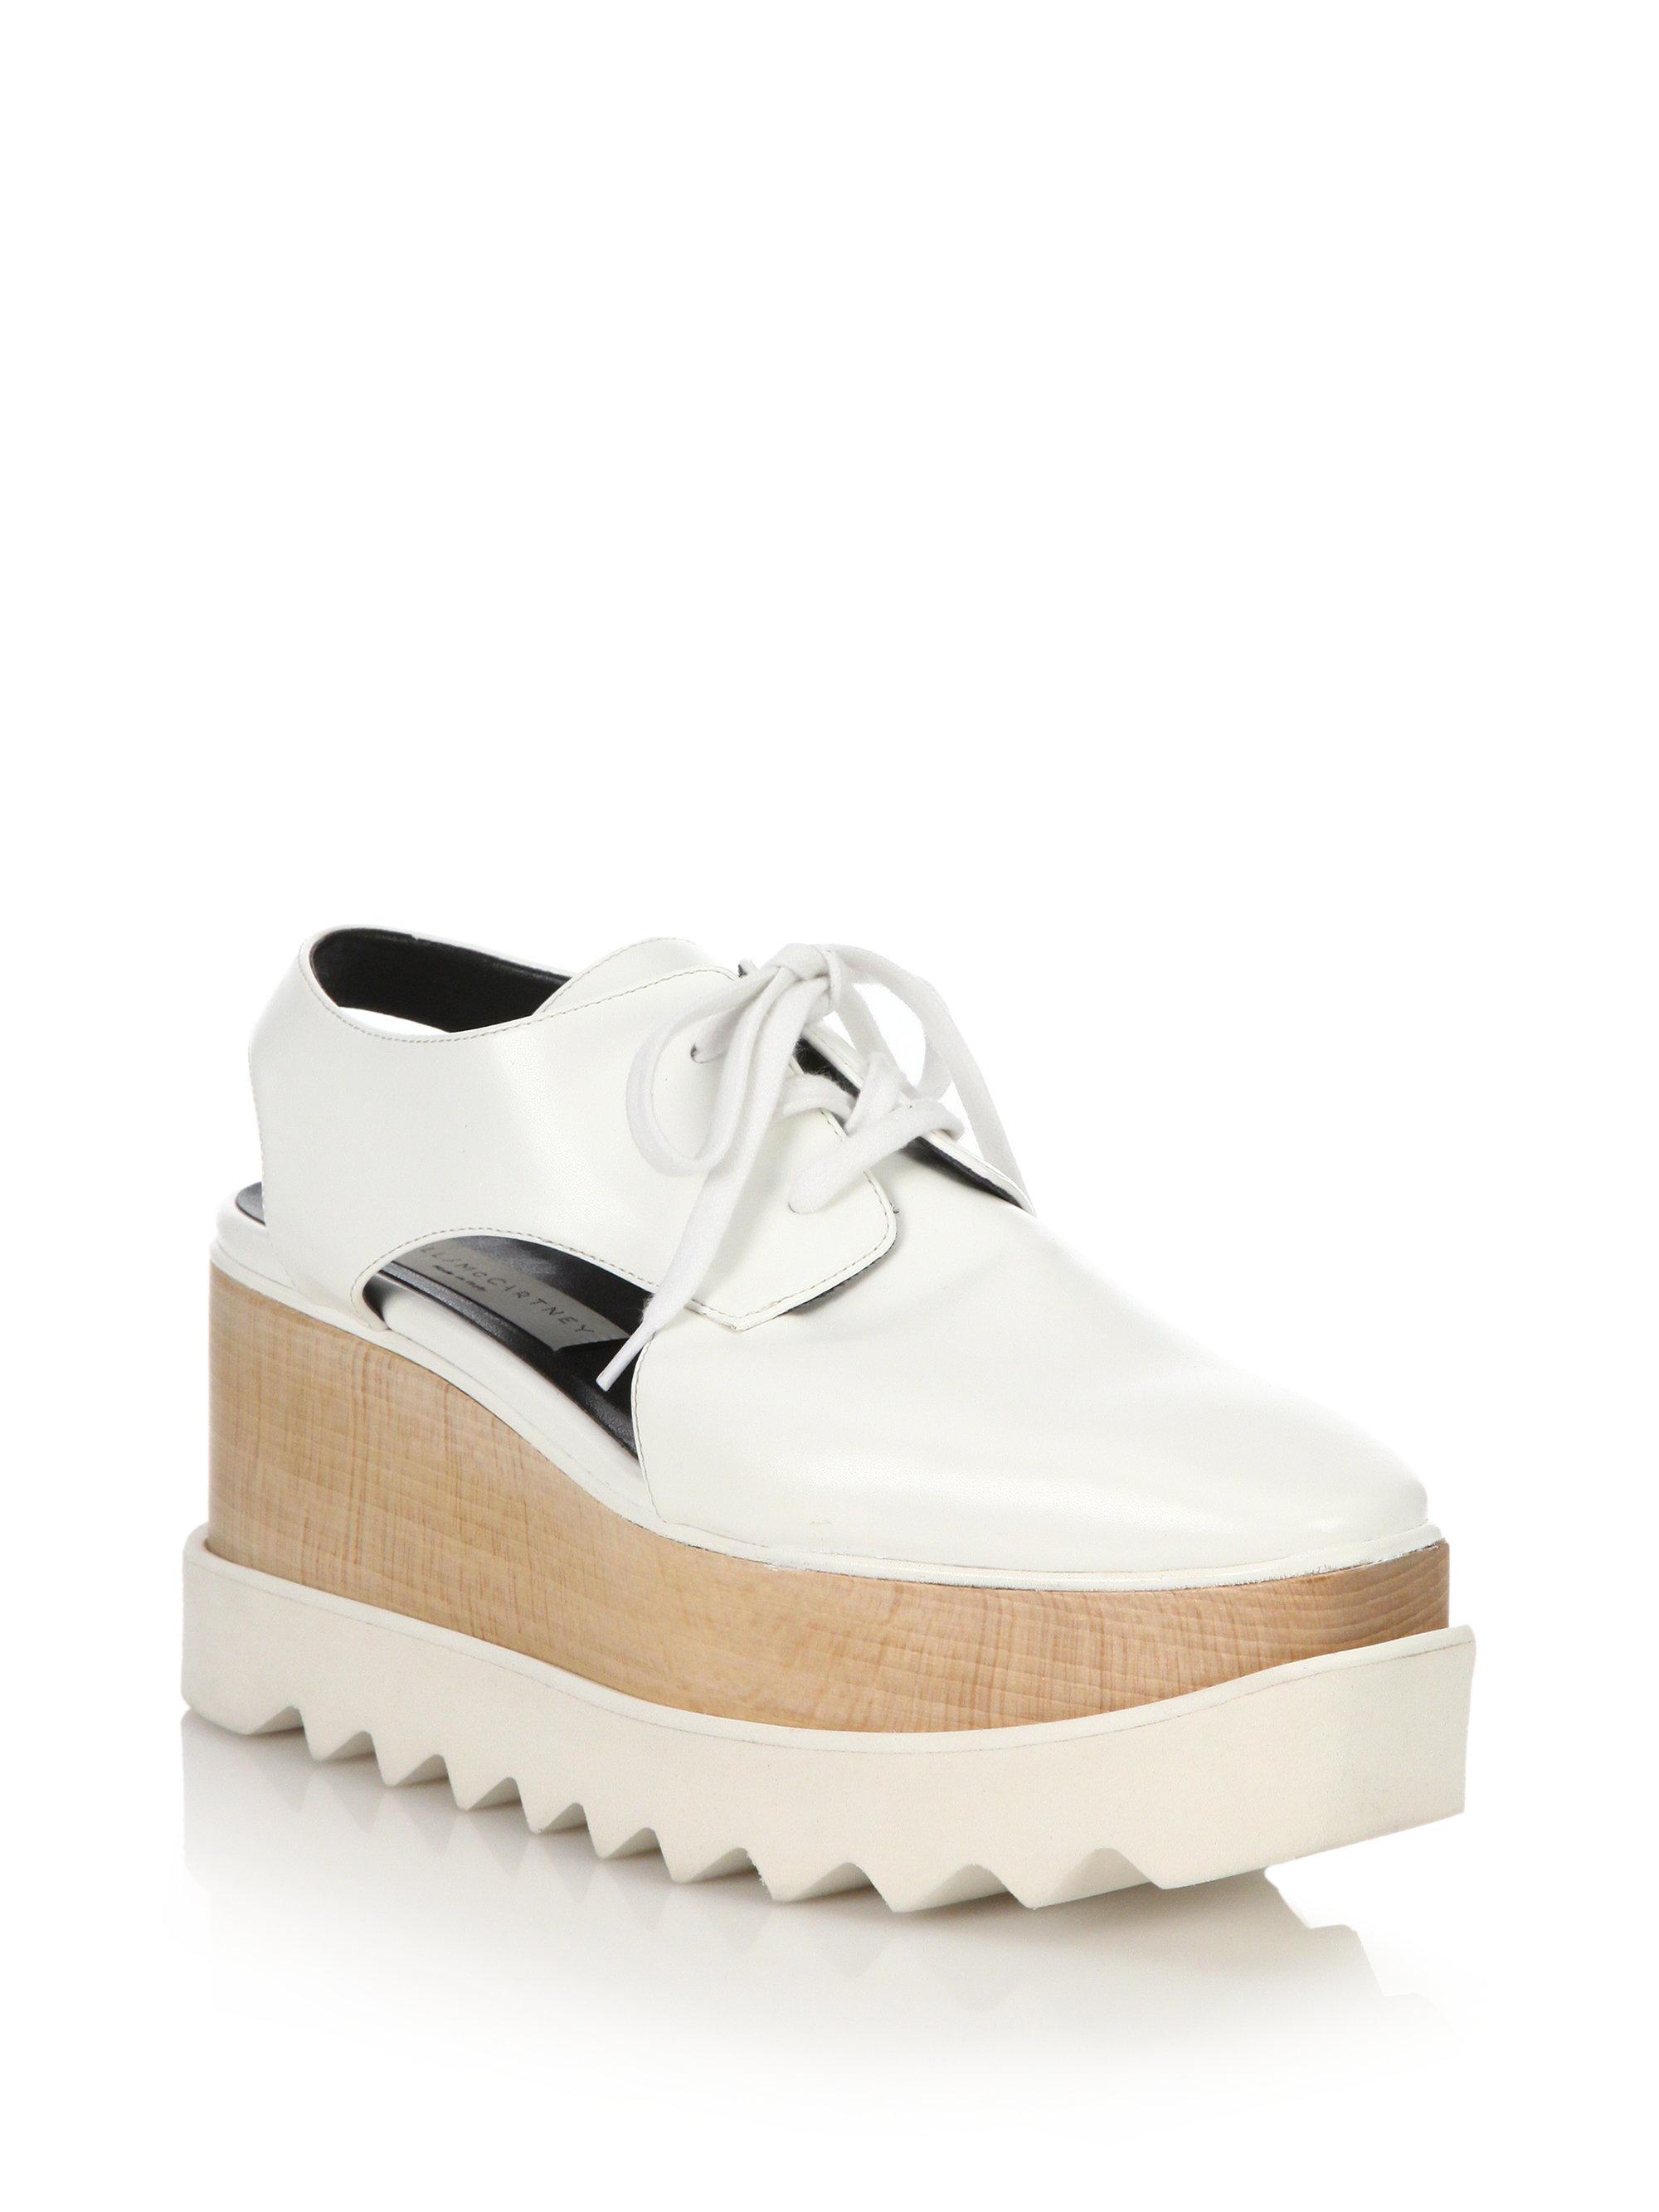 Stella McCartney Elyse Cut-Out Platform Shoes 8qn80Iwtz